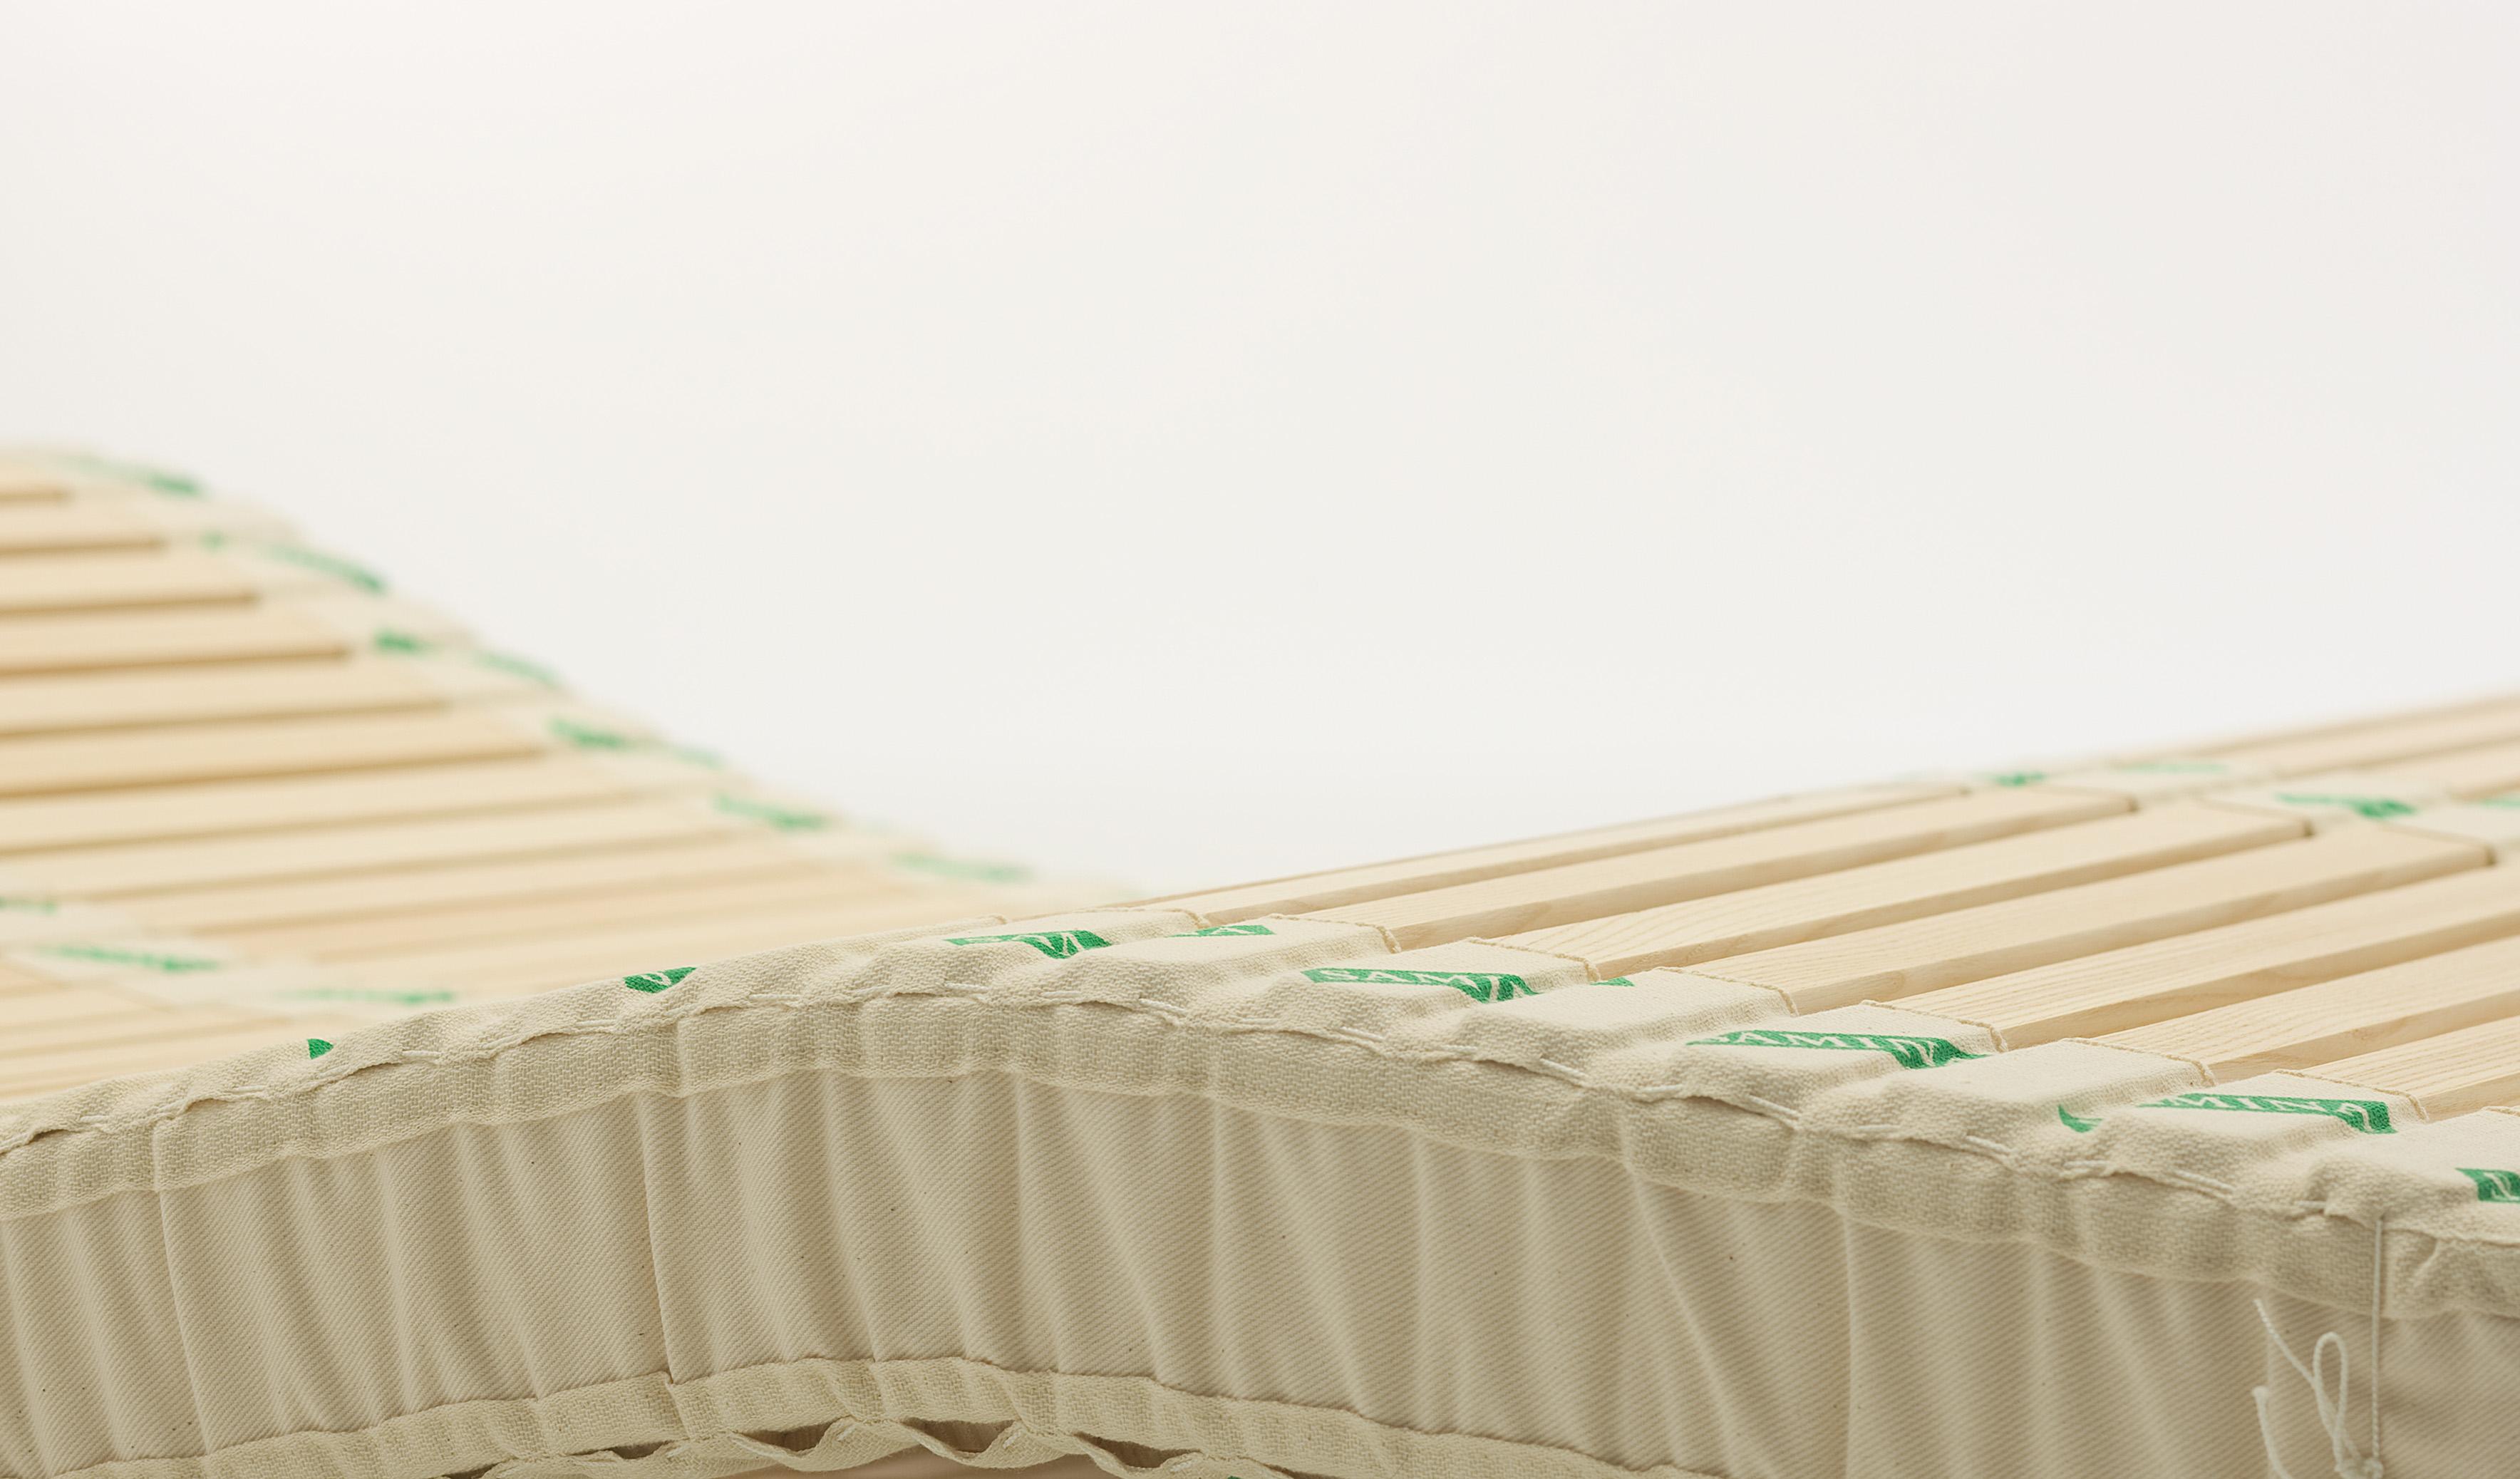 einrichten f rs leben ludwig krenn samina lamellenrost 90 210. Black Bedroom Furniture Sets. Home Design Ideas